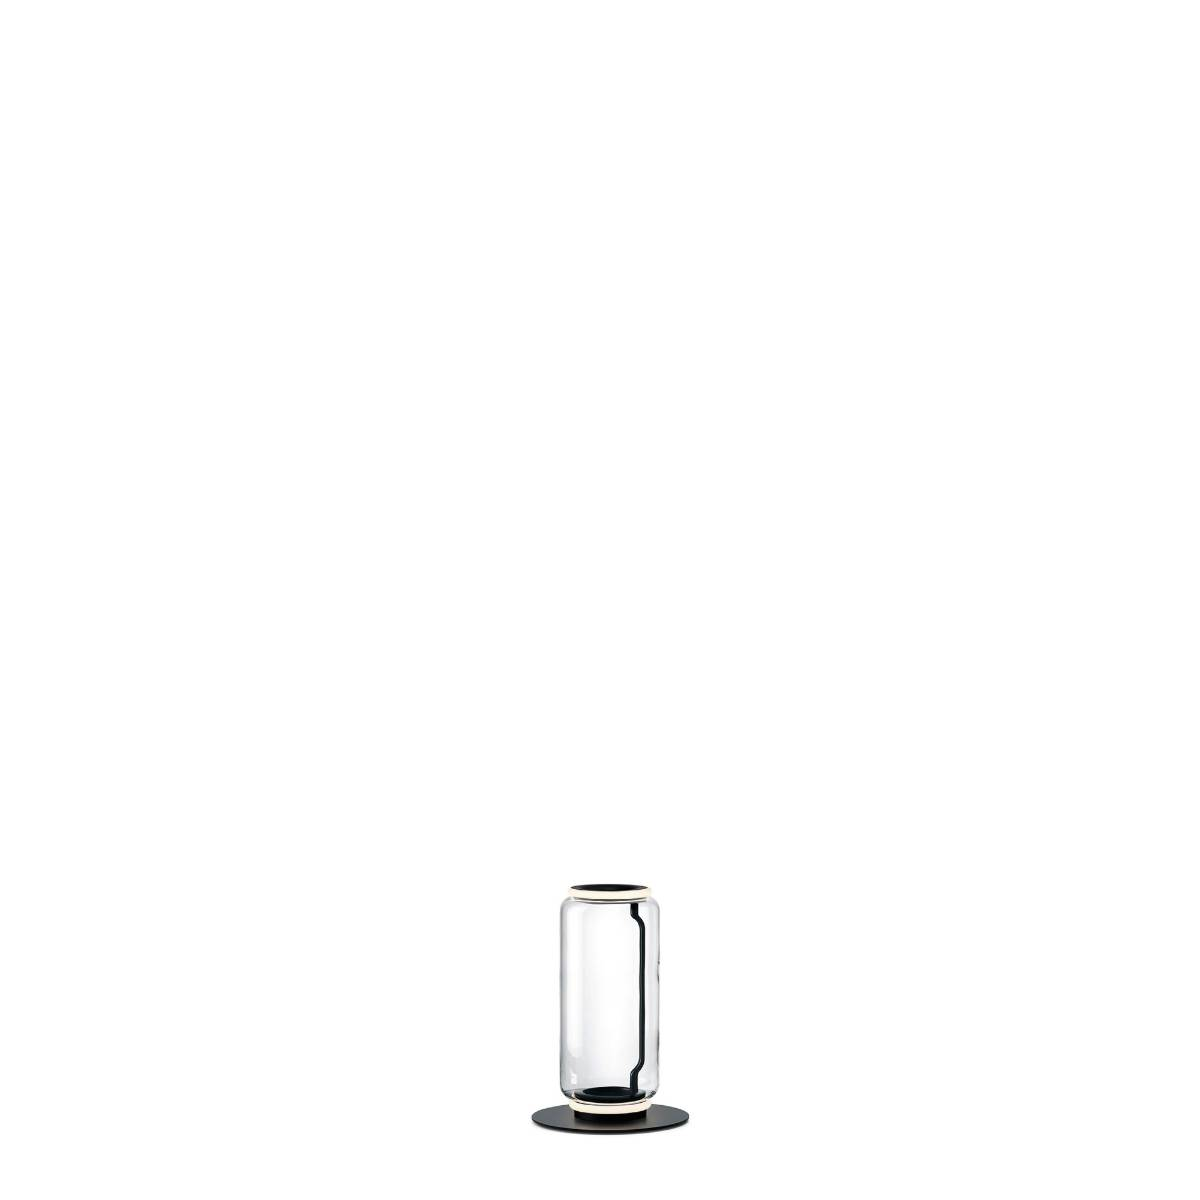 Flos Noctambule F1 High Cylinders Small Base Vloerlamp